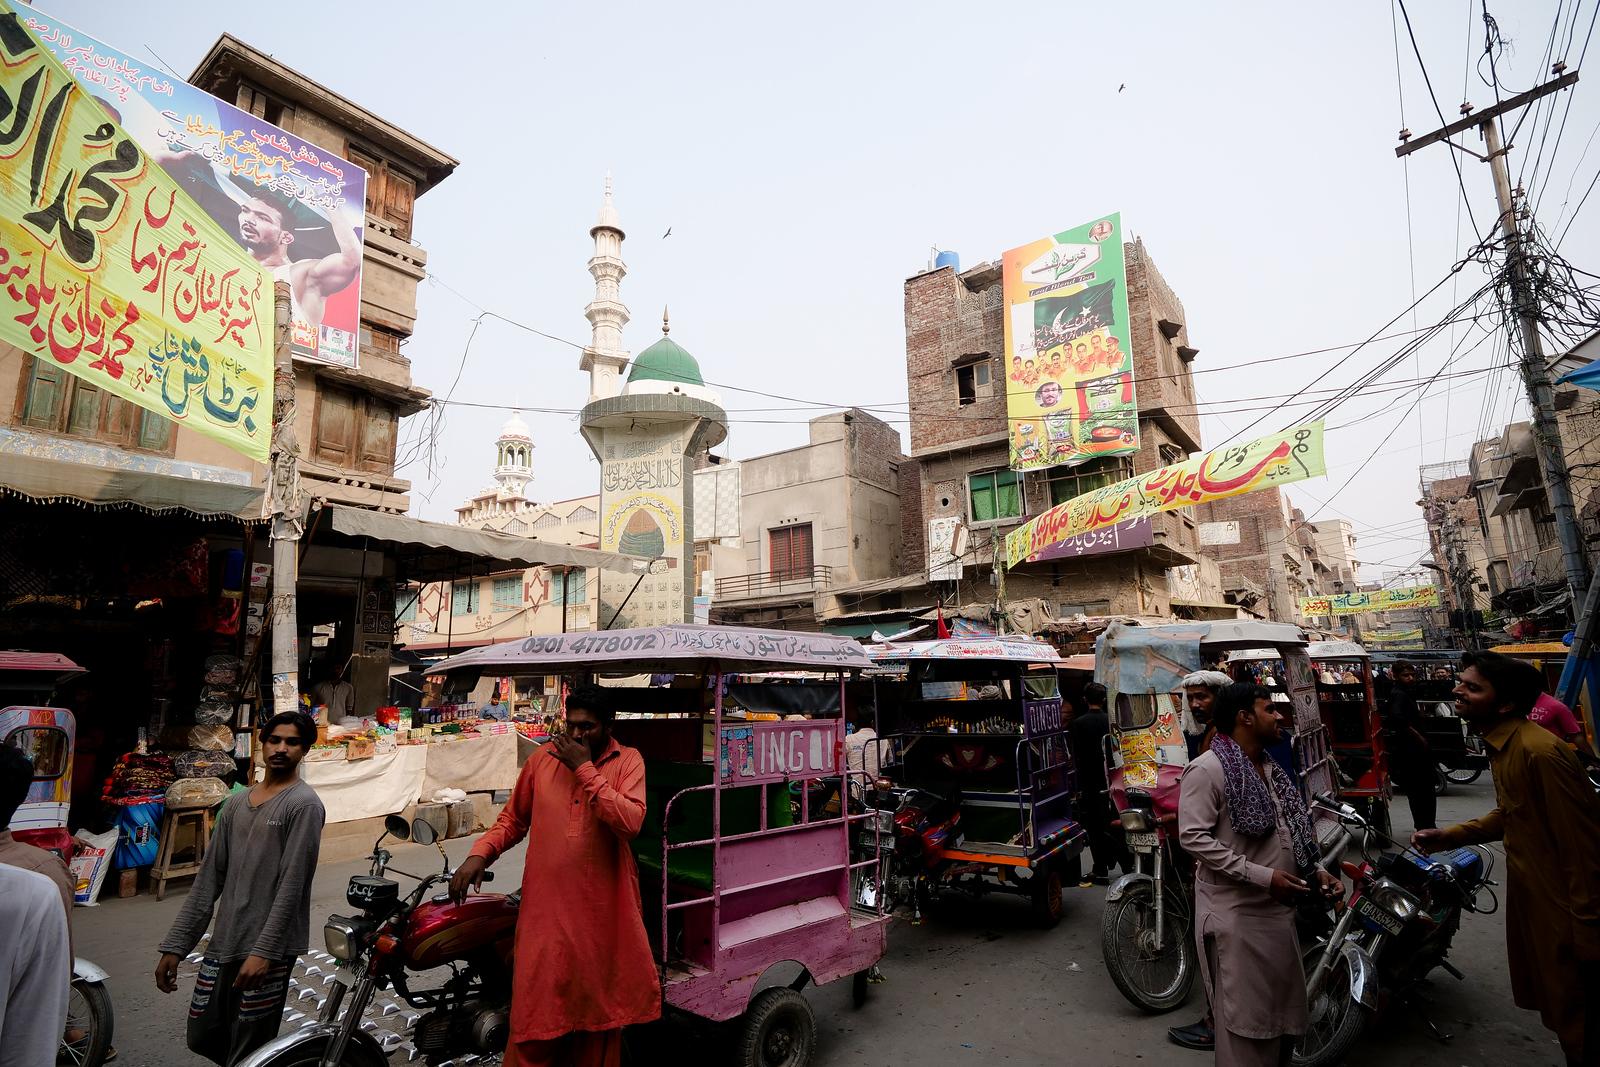 Afternoon Market in Gujranwala